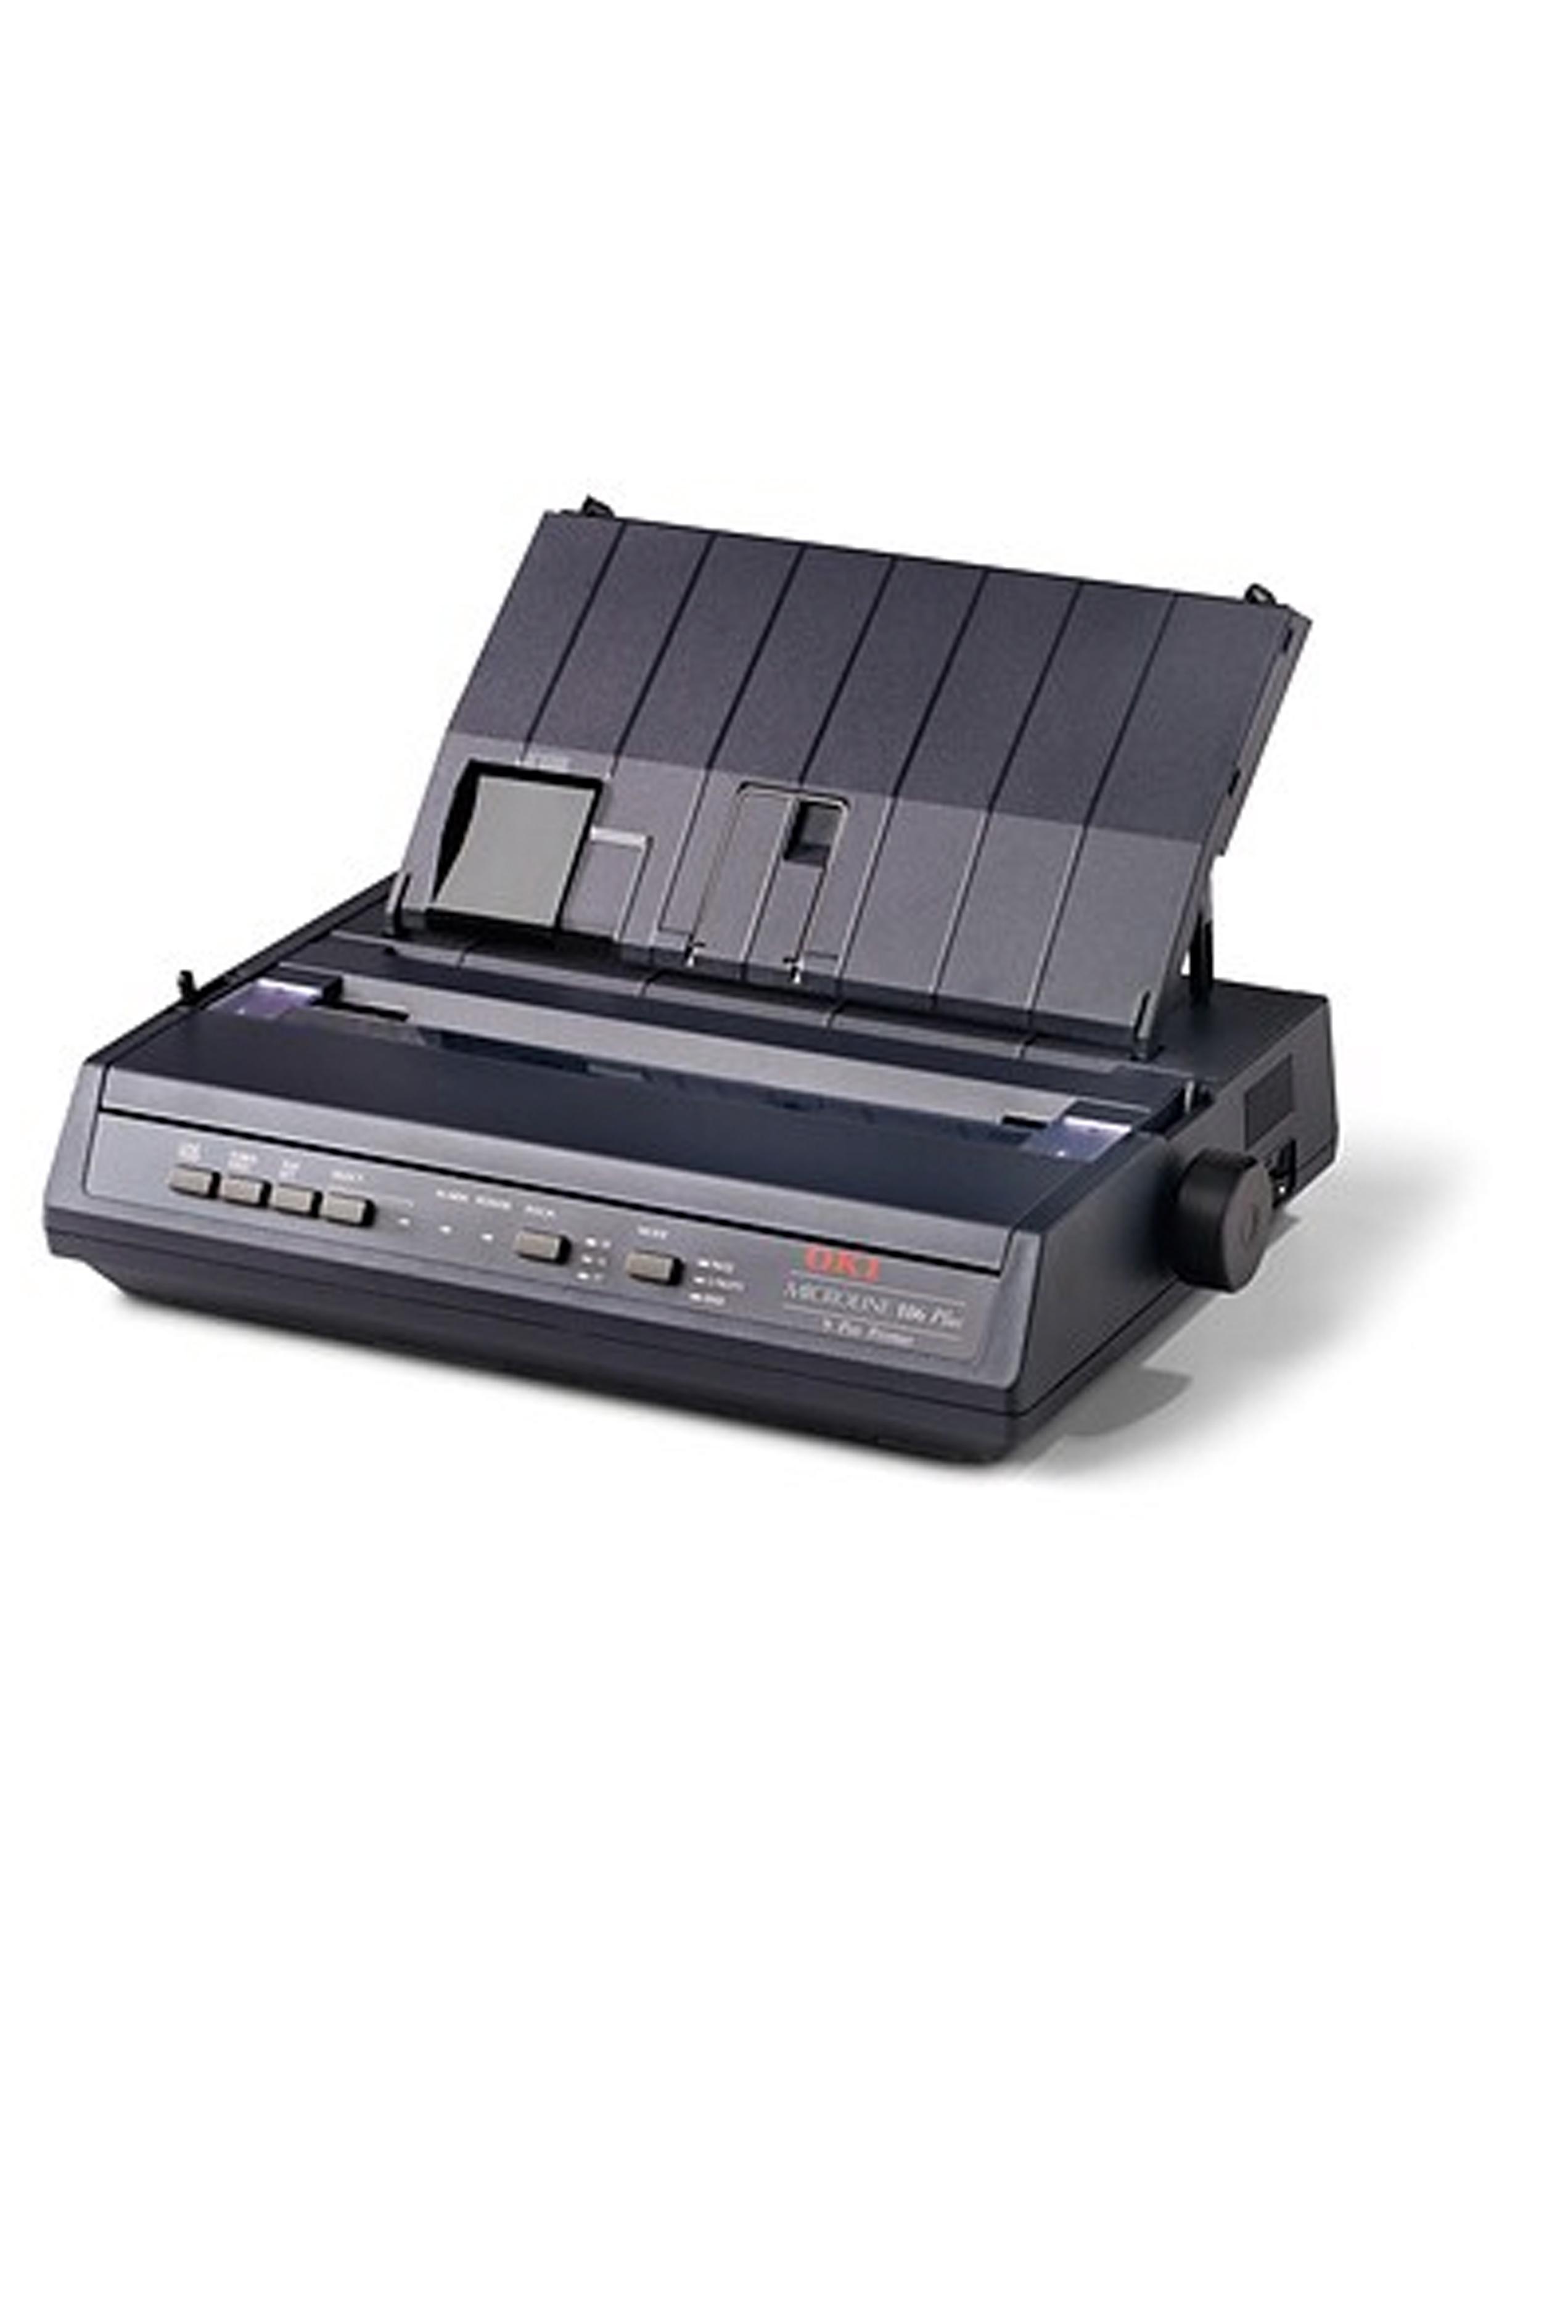 Okidata ML186PLUS Black, Parallel Printer (62448701)